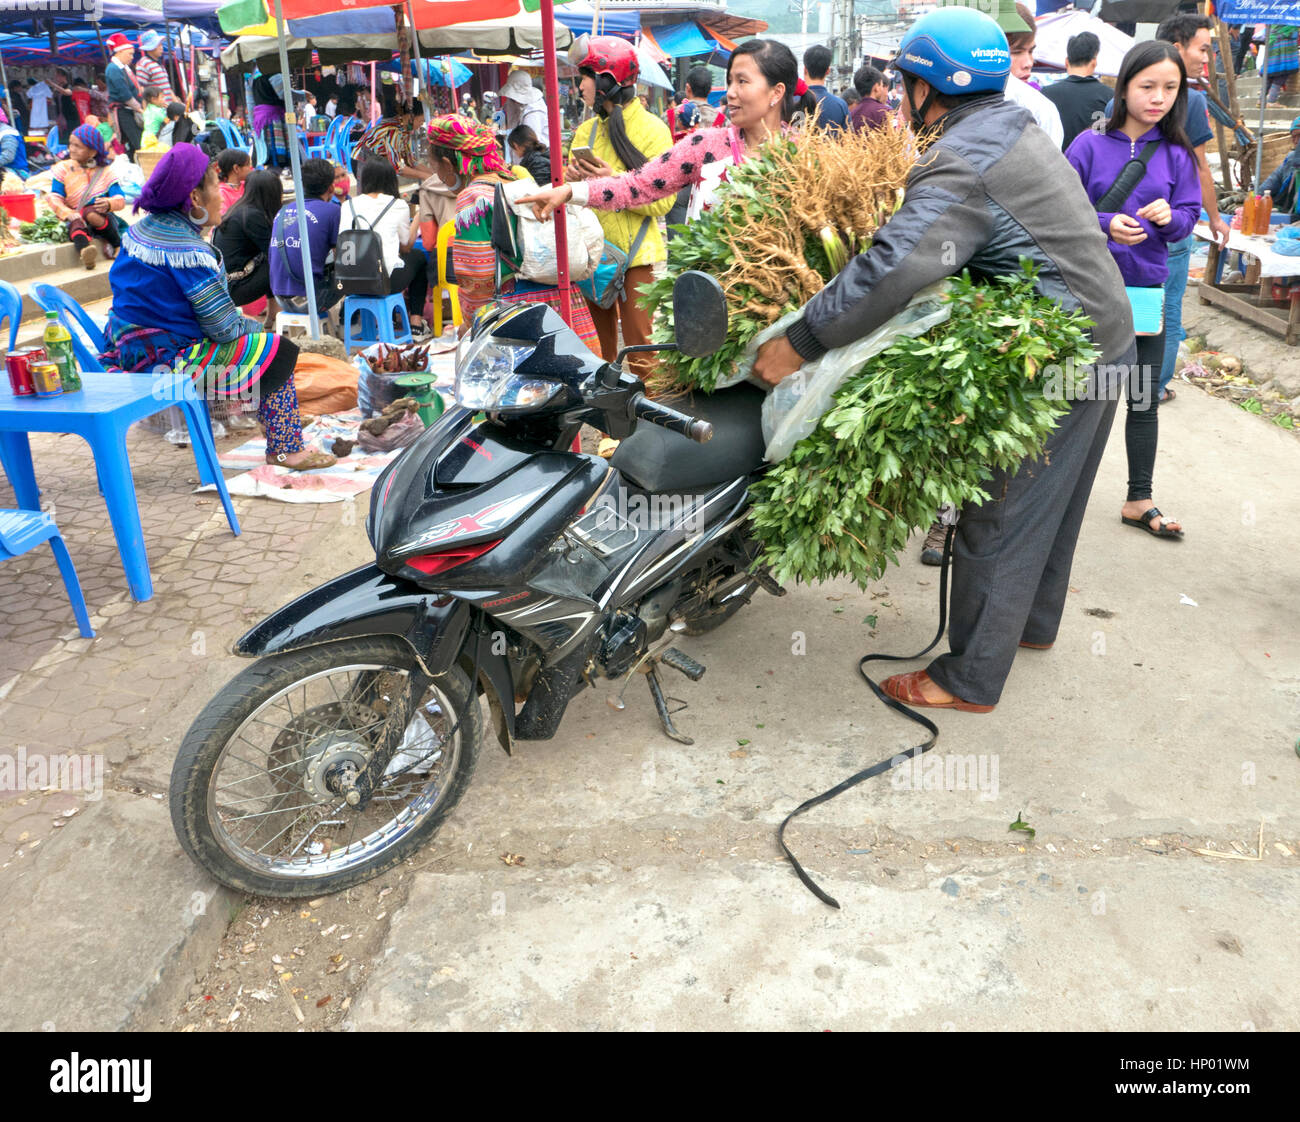 Motorcyclist unloading harvested celery at Bac Ha Farmers Market,  Motorcycle, Mode Of Transportation, Bac Ha. - Stock Image